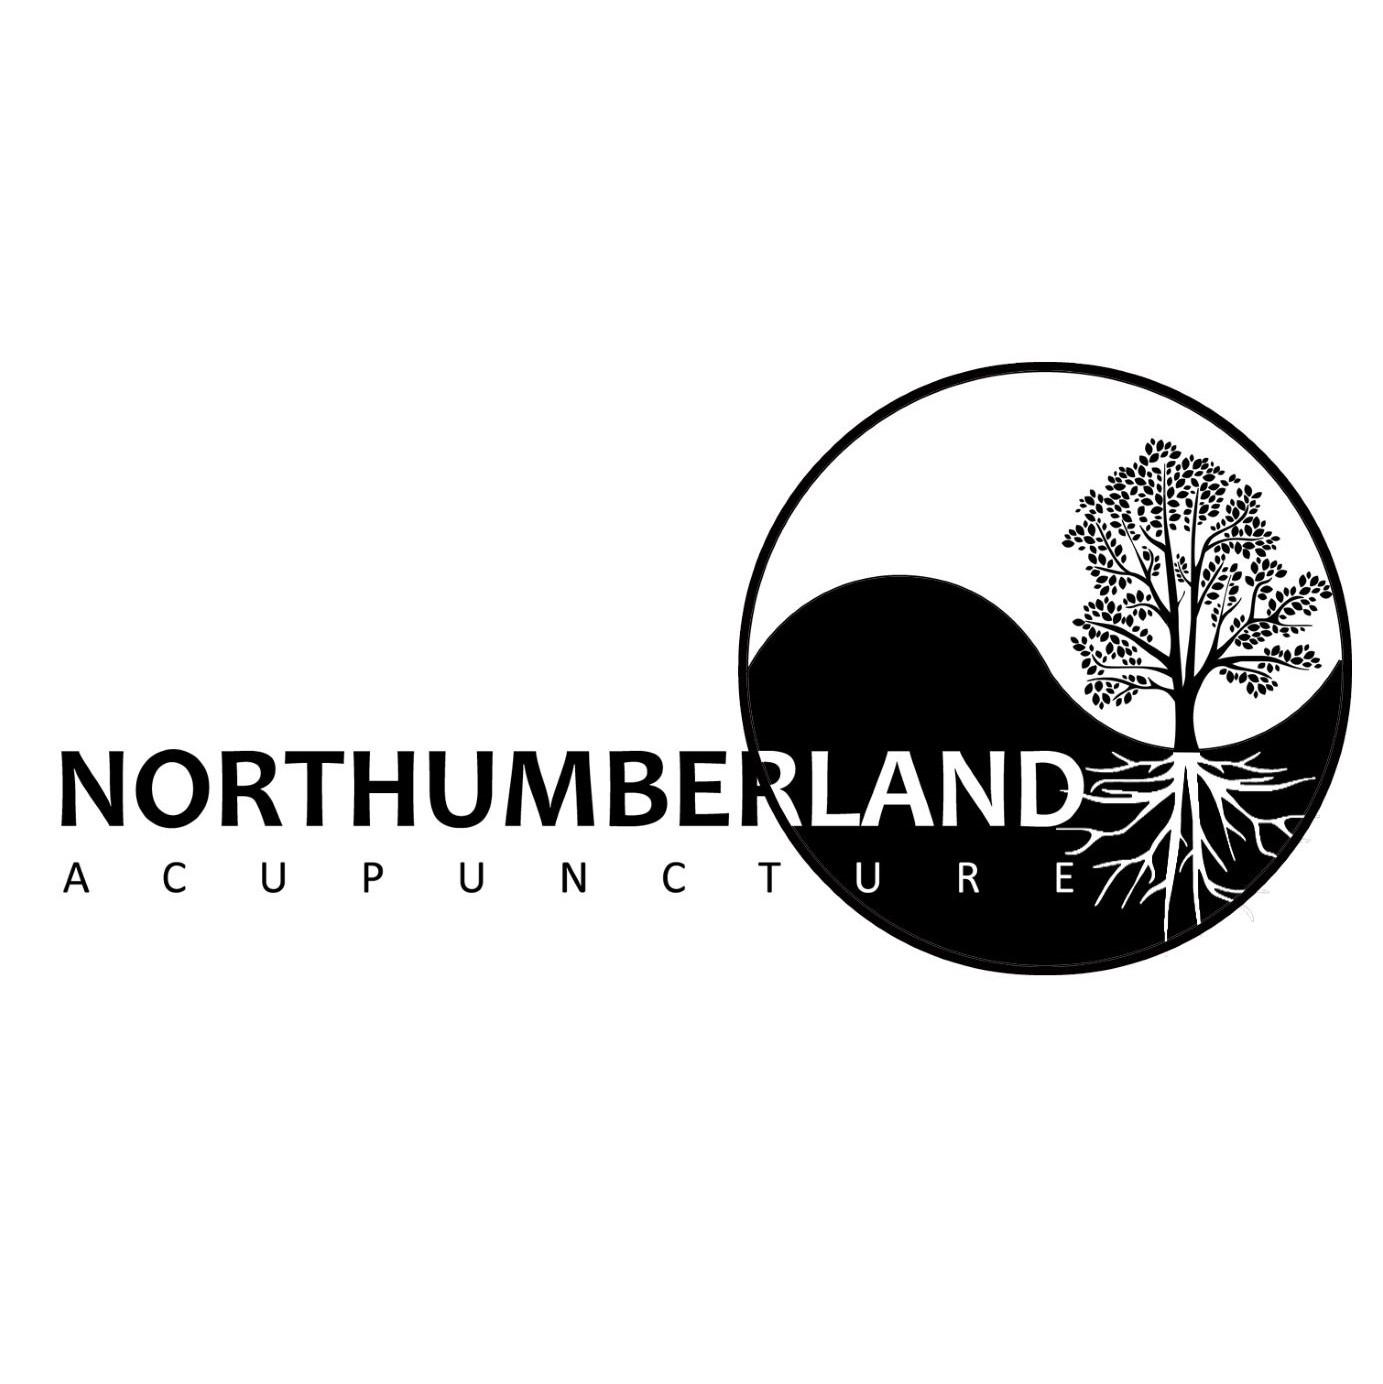 Northumberland Acupuncture